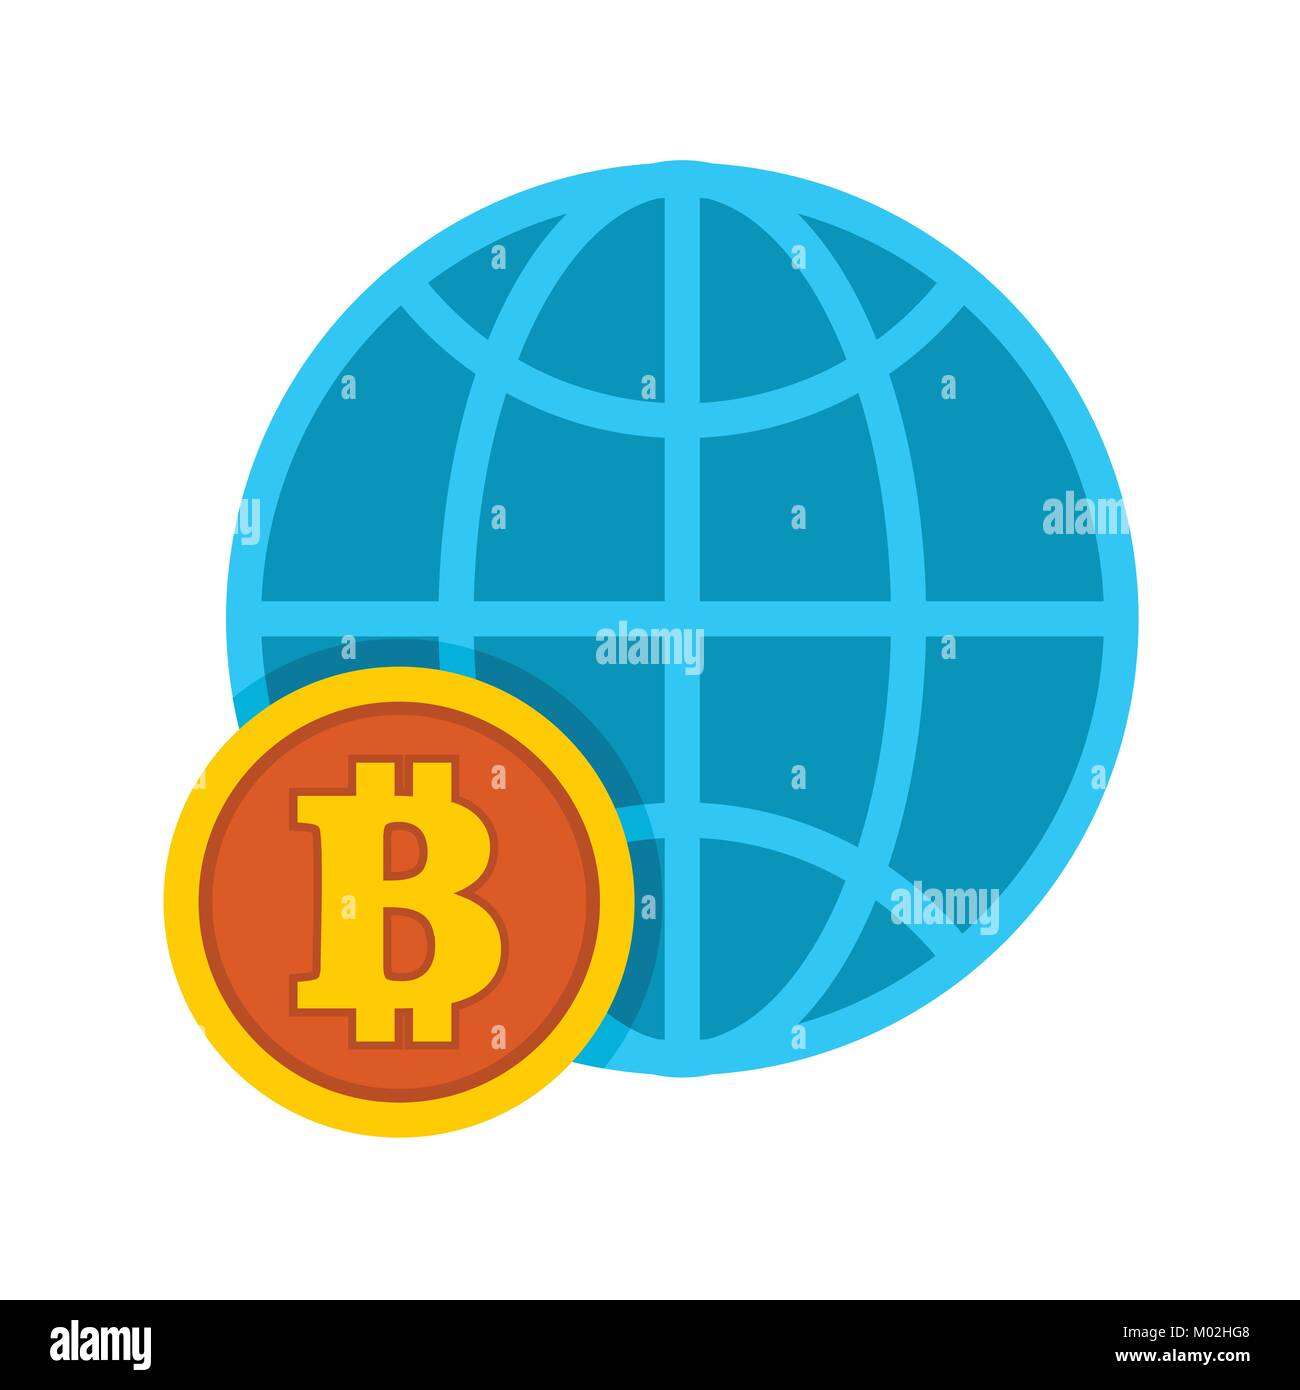 Bitcoin Worldwide Global Trend Vector Illustration Graphic - Stock Vector